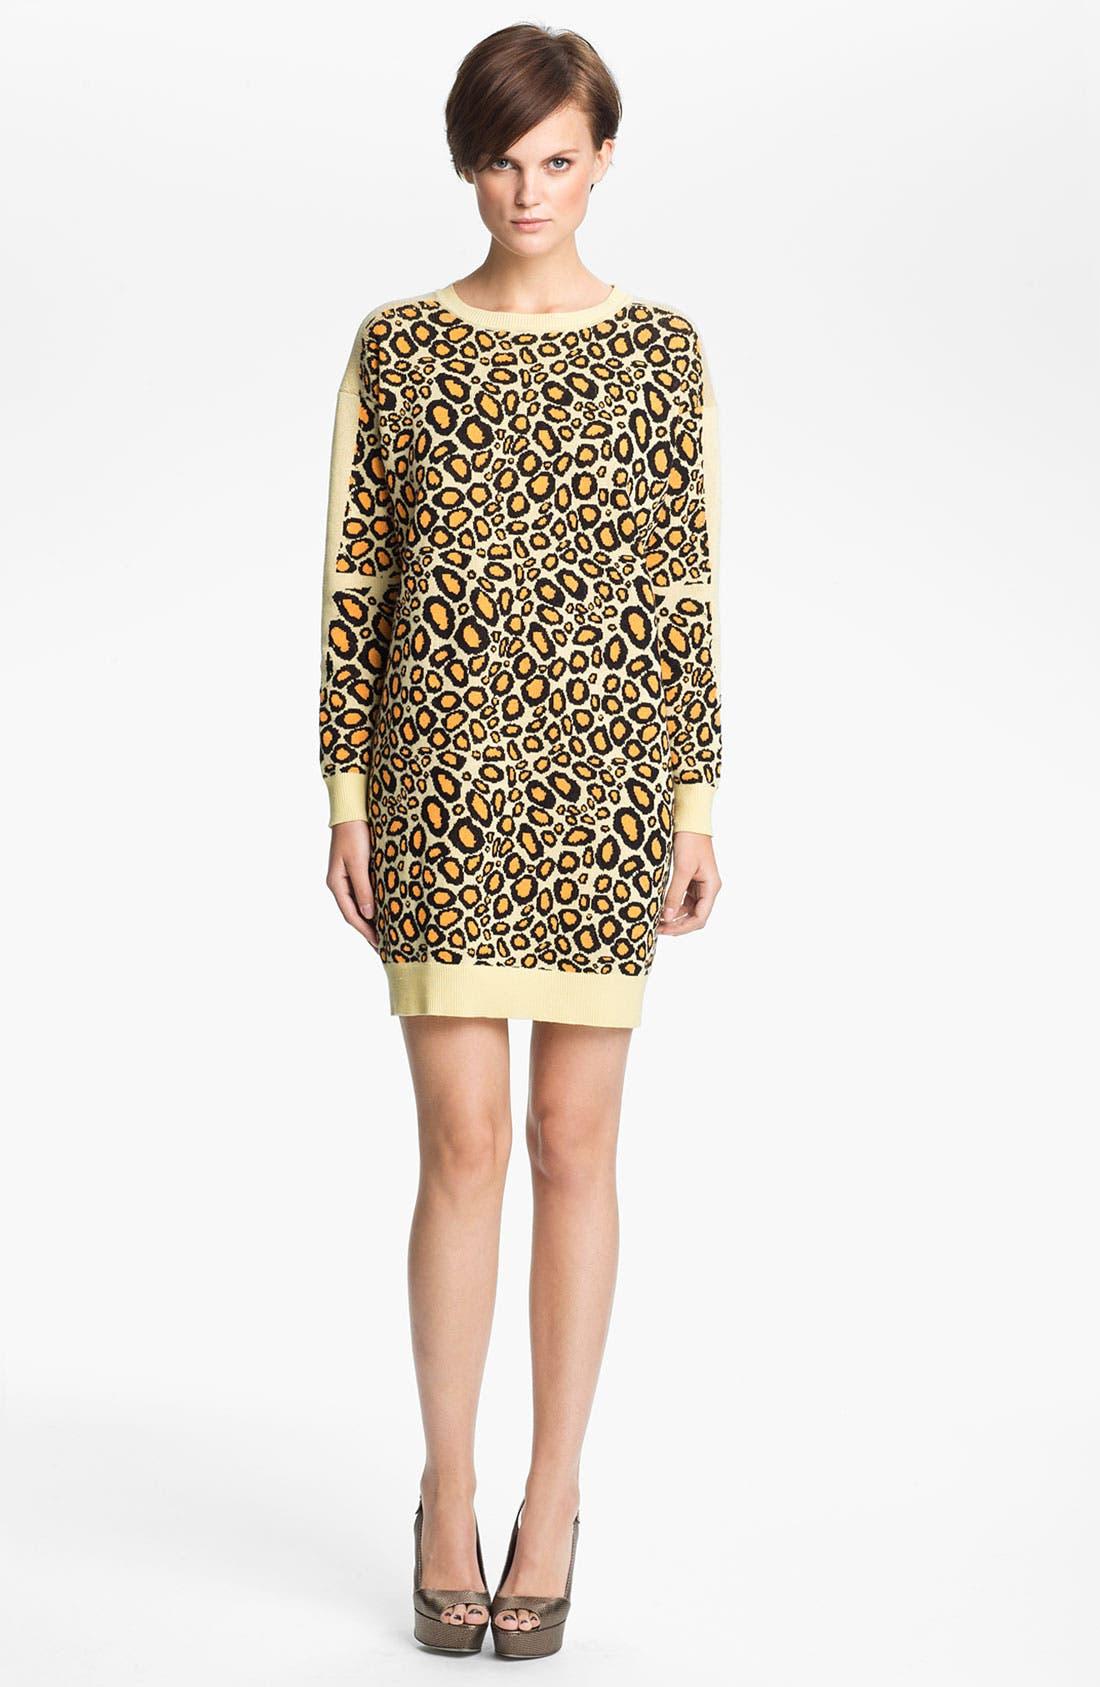 Alternate Image 1 Selected - KENZO Leopard Jacquard Sweater Dress